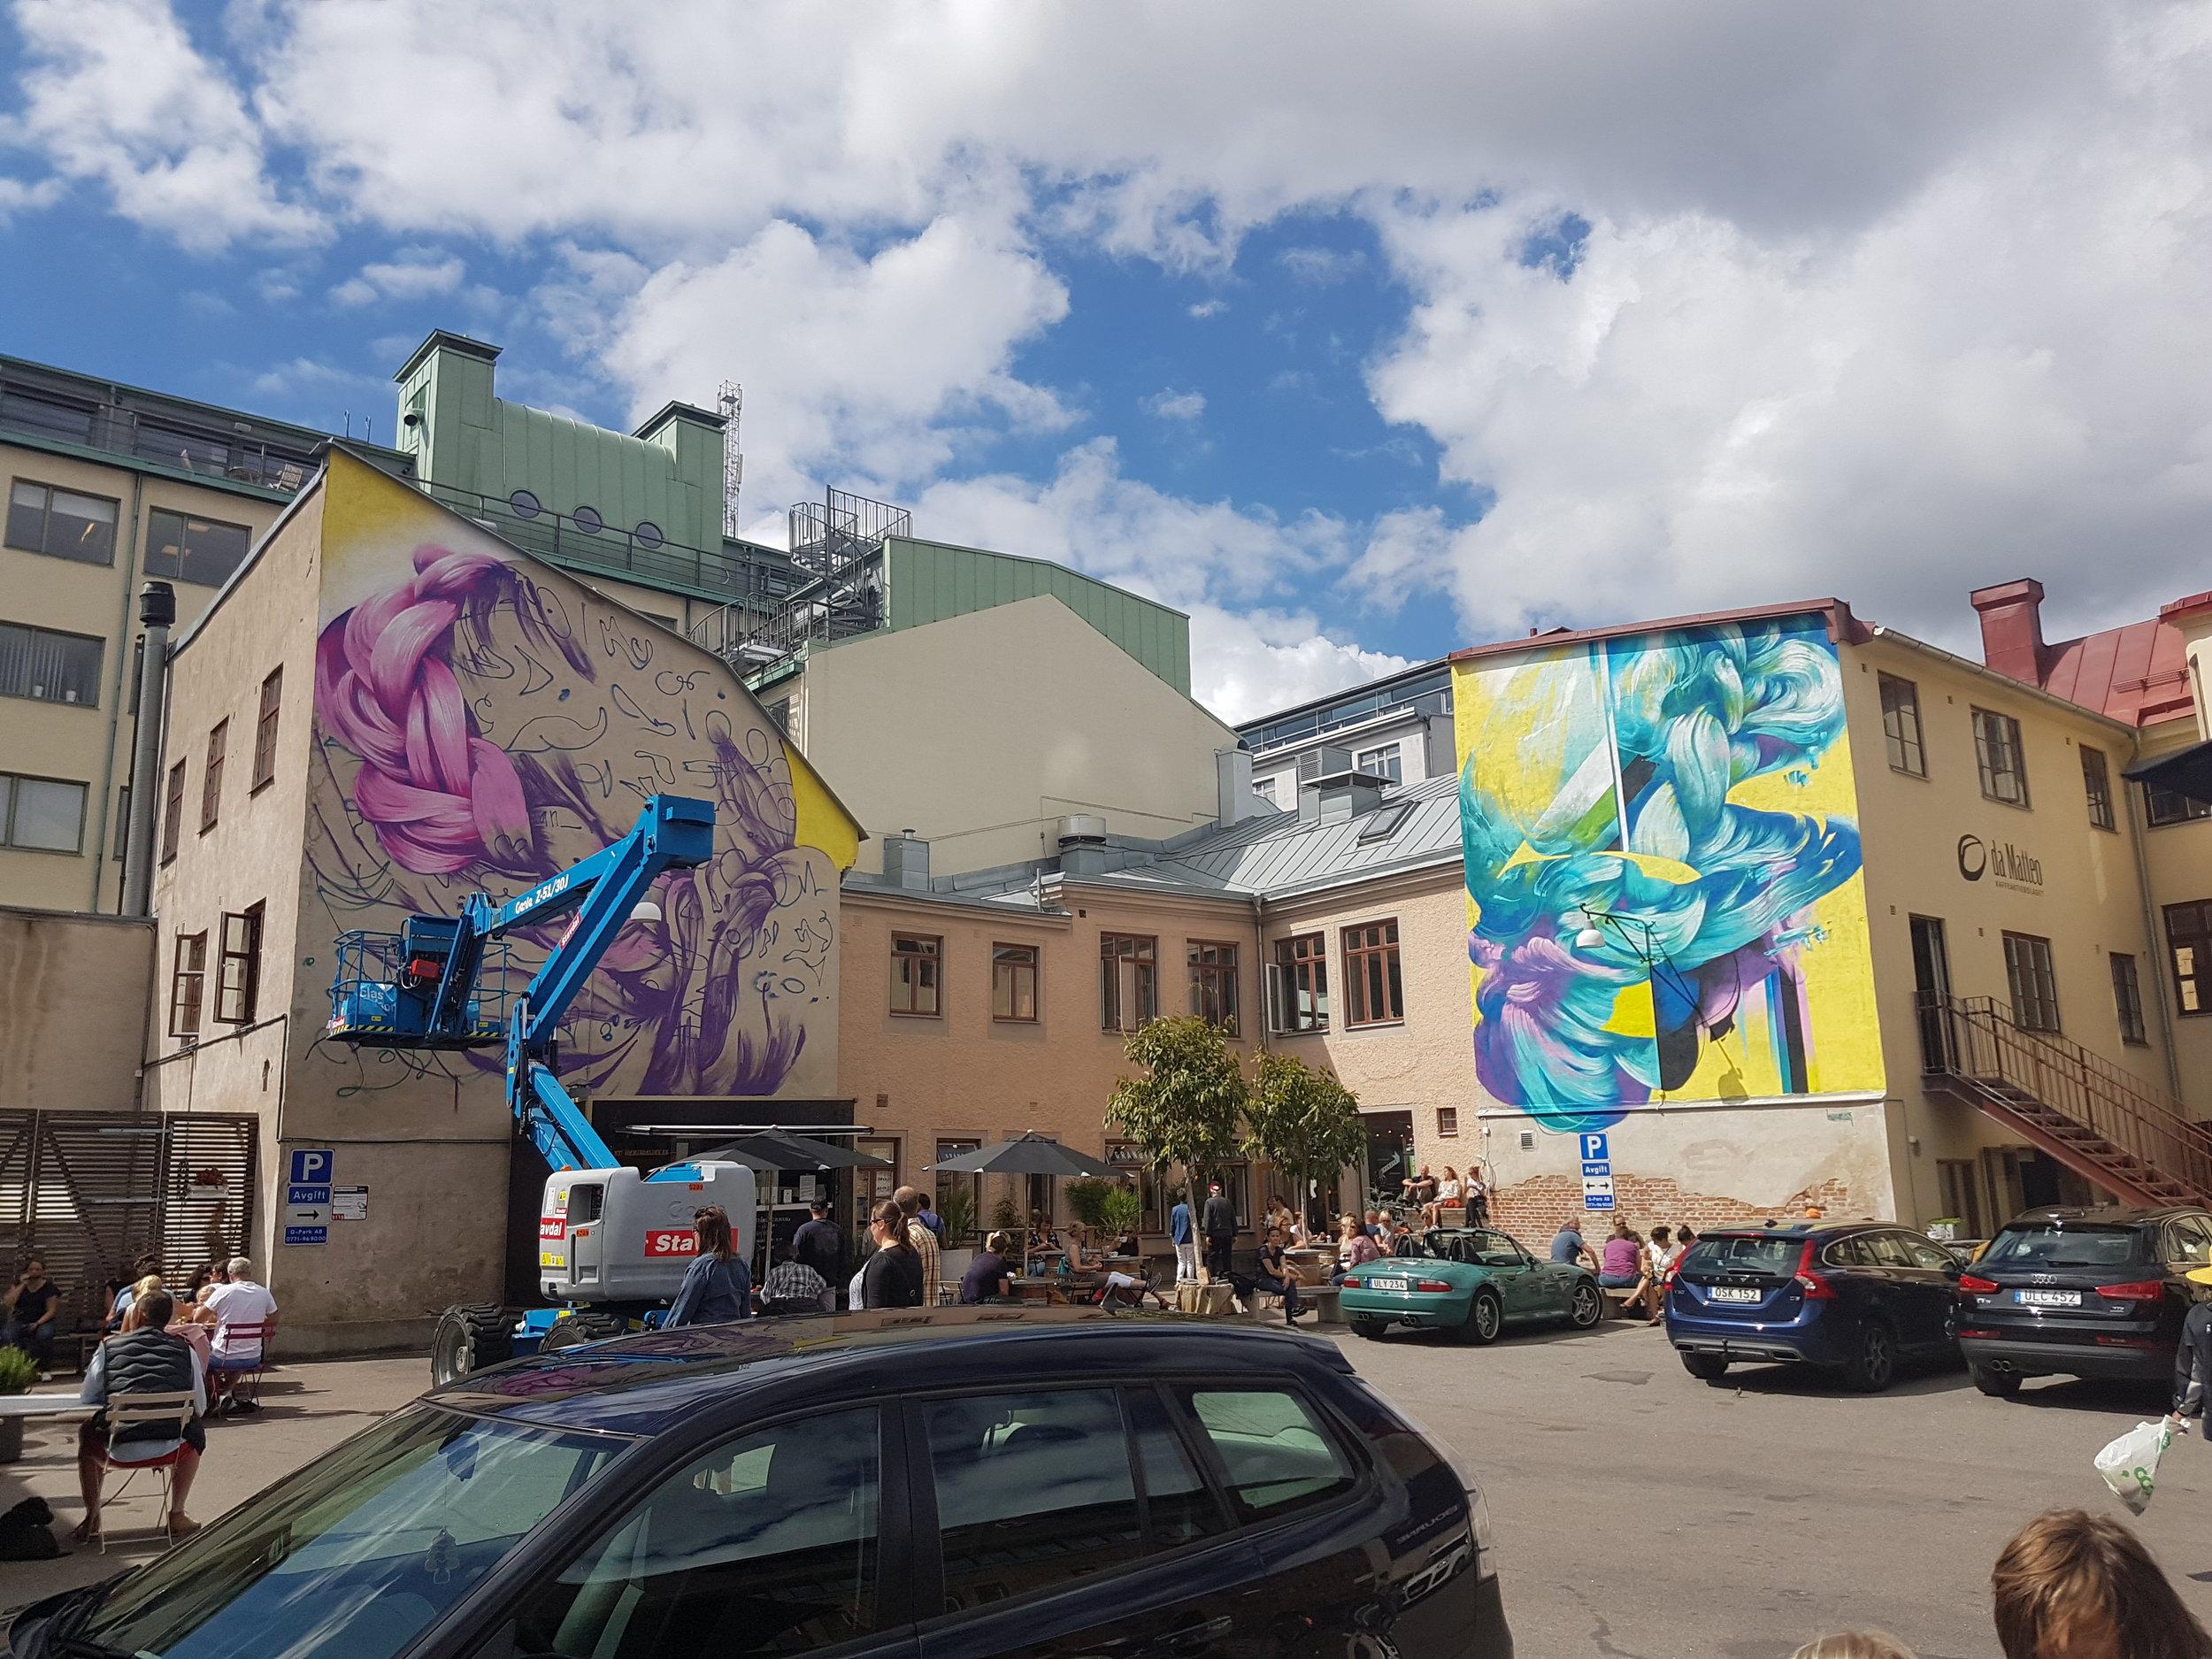 HUEMAN_Artscape_2016-07-31_TorHedendahl_4032x3024_28.jpg